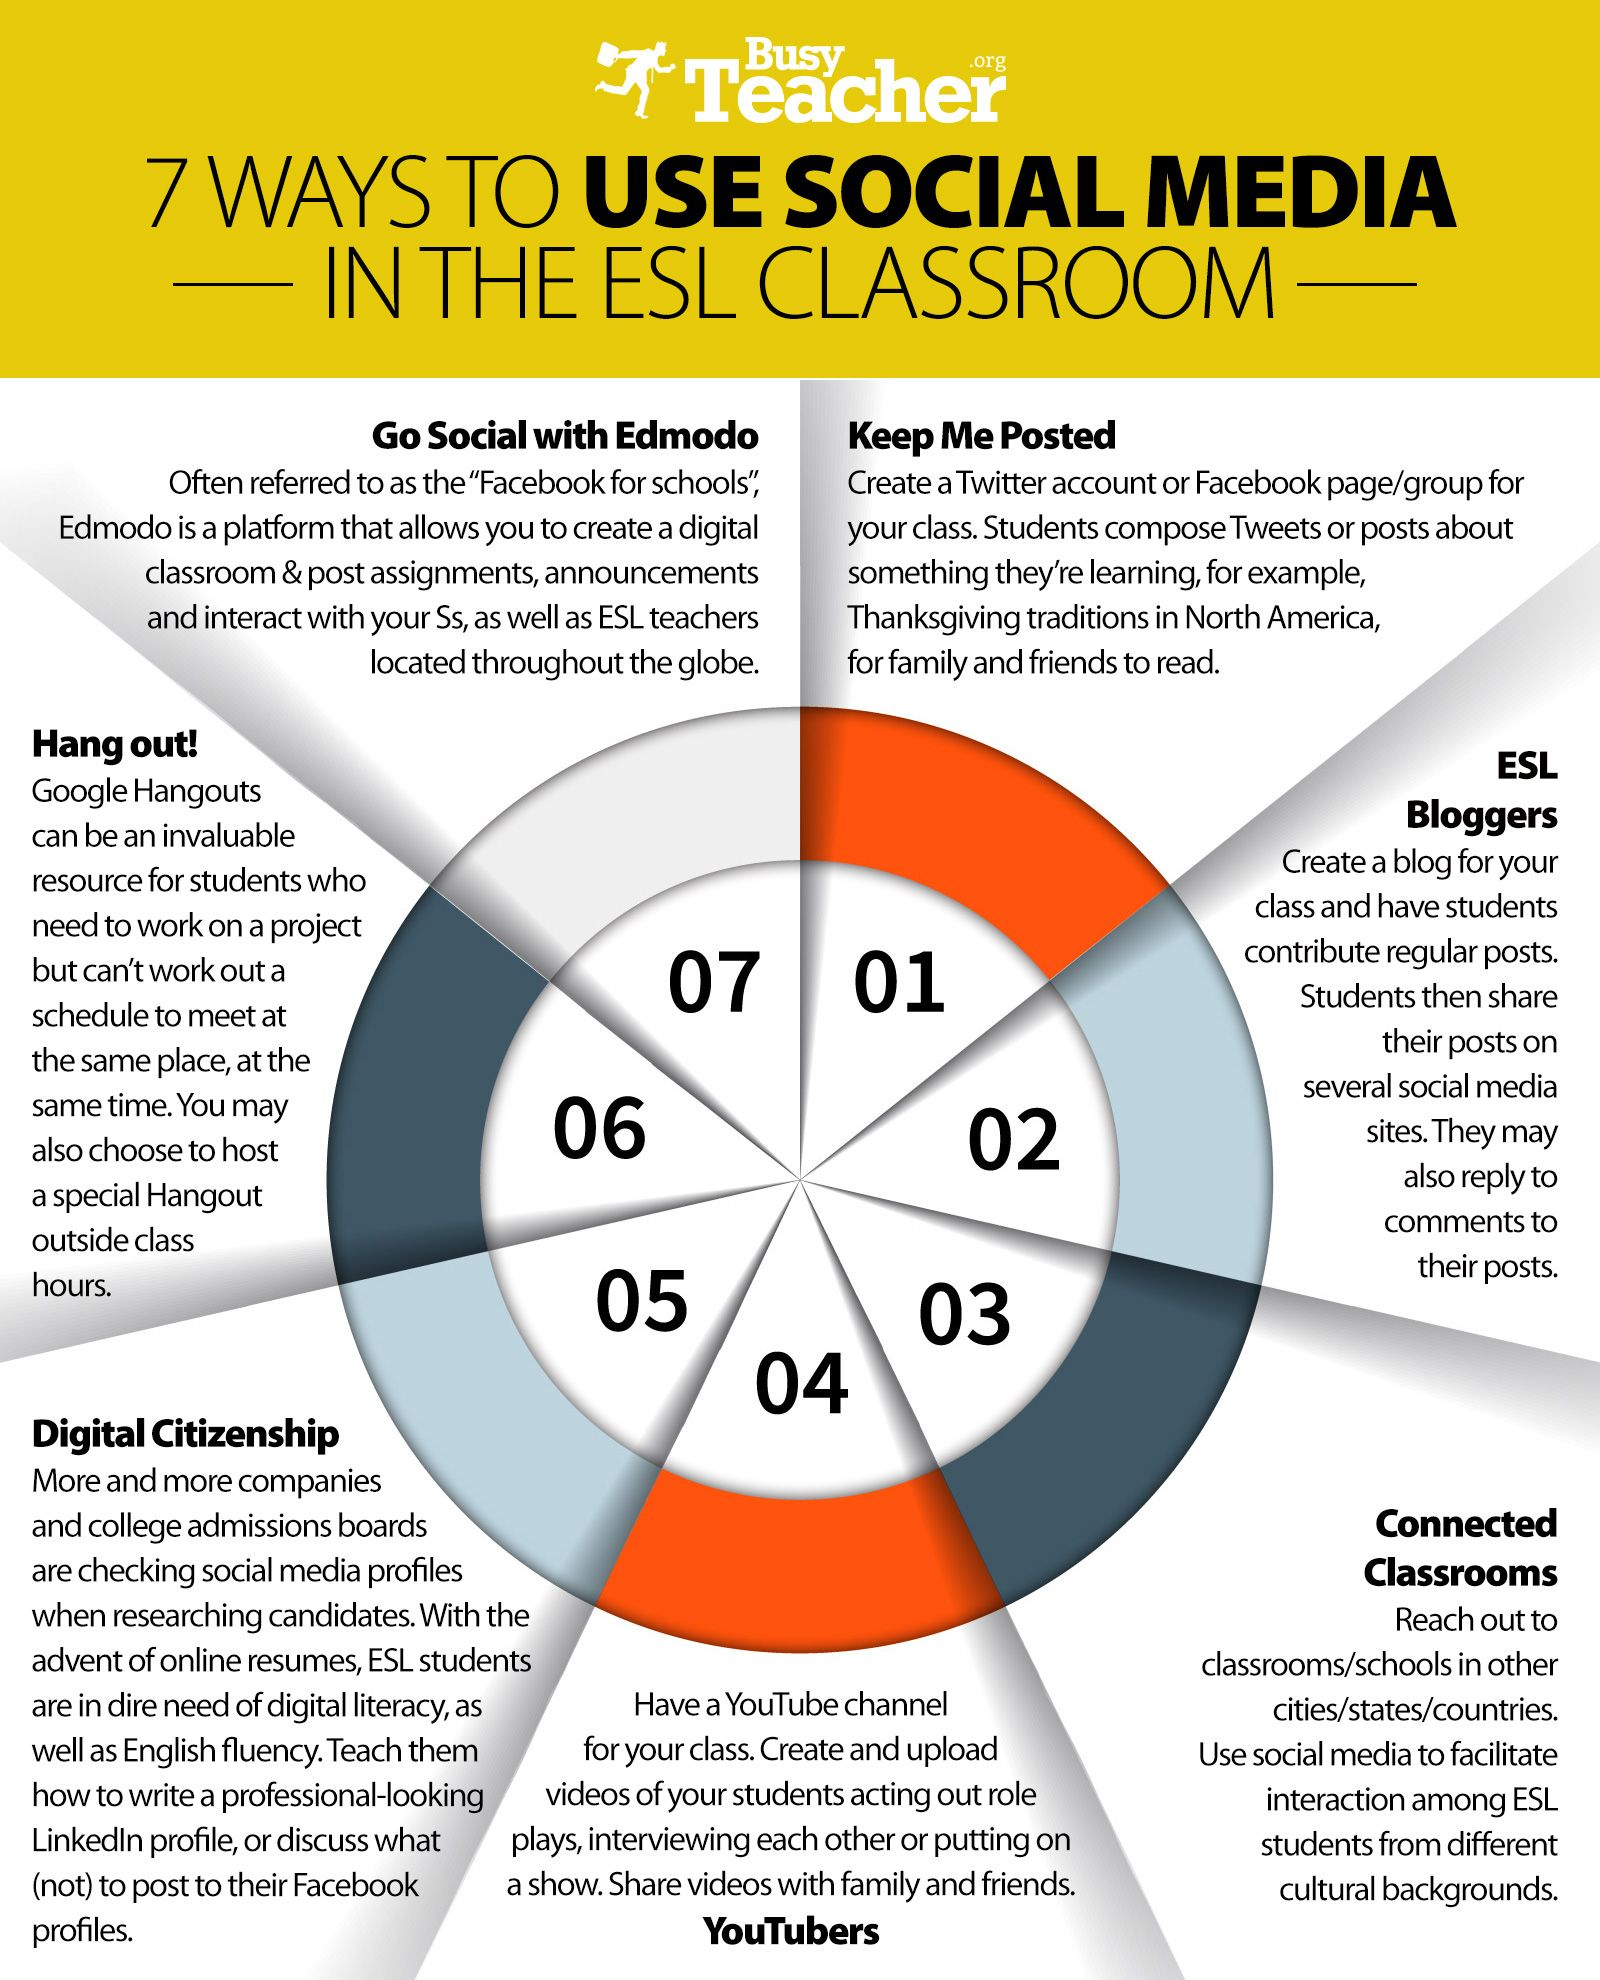 7 Ways To Use Social Media In The Esl Classroom